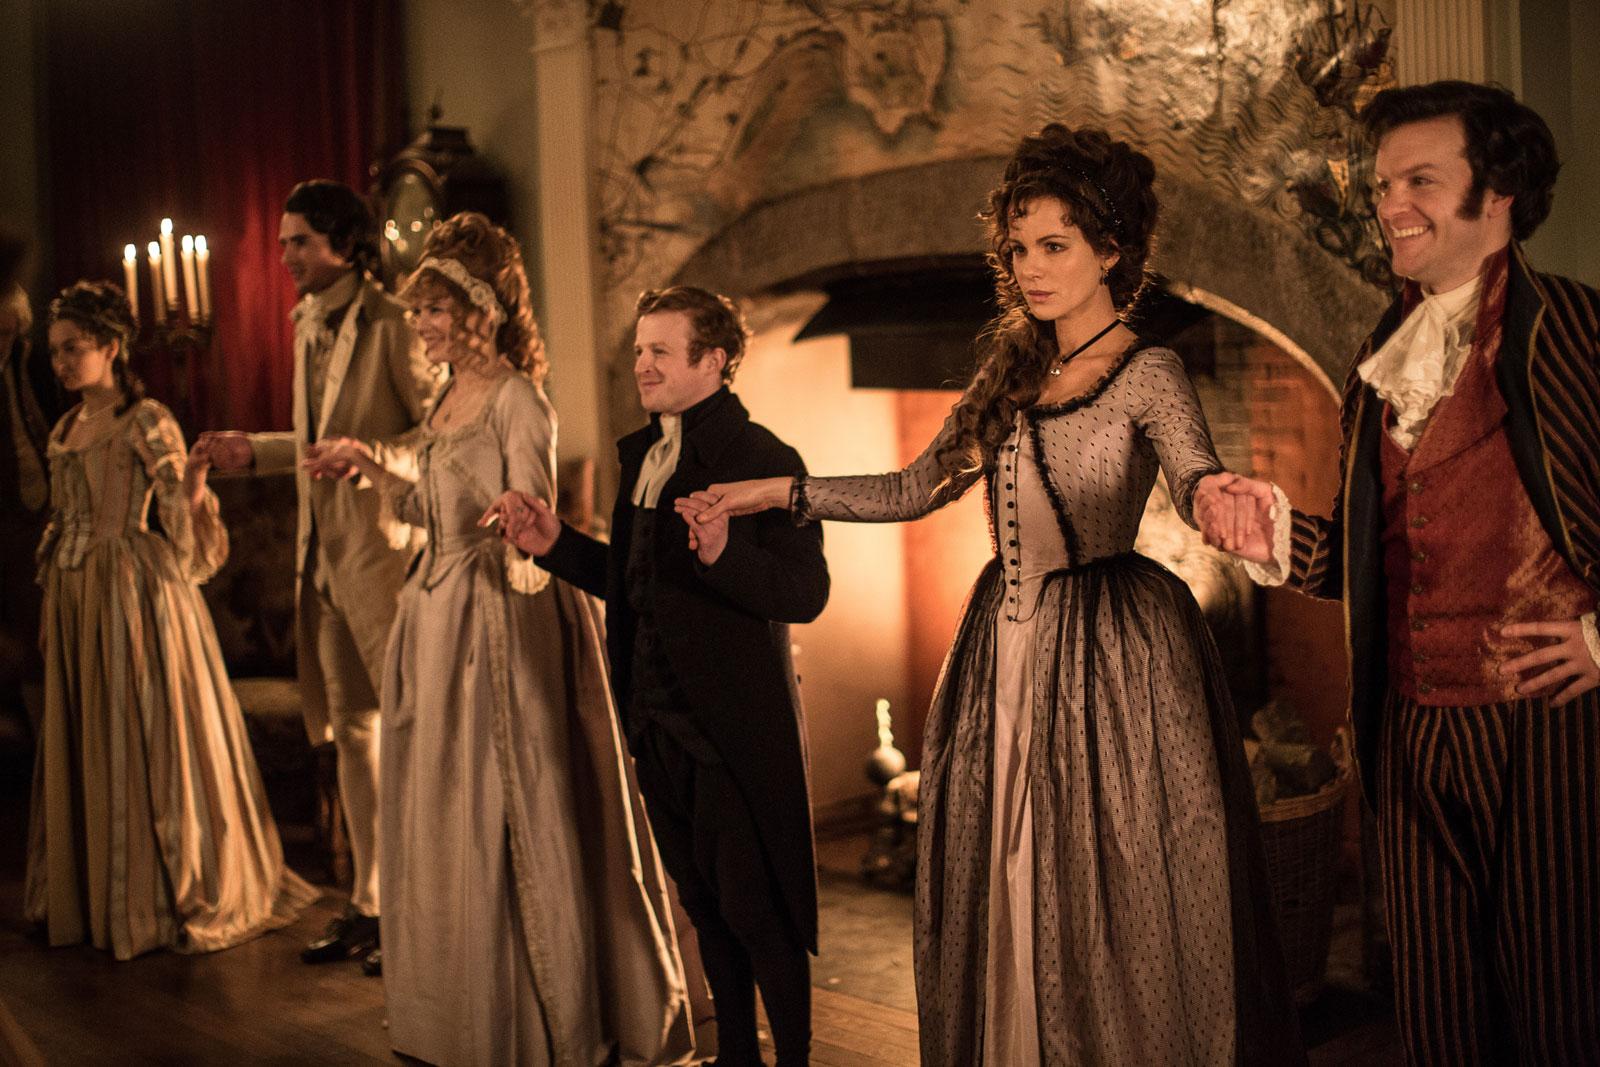 Kate Beckinsale as Lady Susan Vernon (right) and Tom Bennett as Sir James Martin (far right) in Whit Stillman's <em>Love &amp; Friendship</em>, 2016